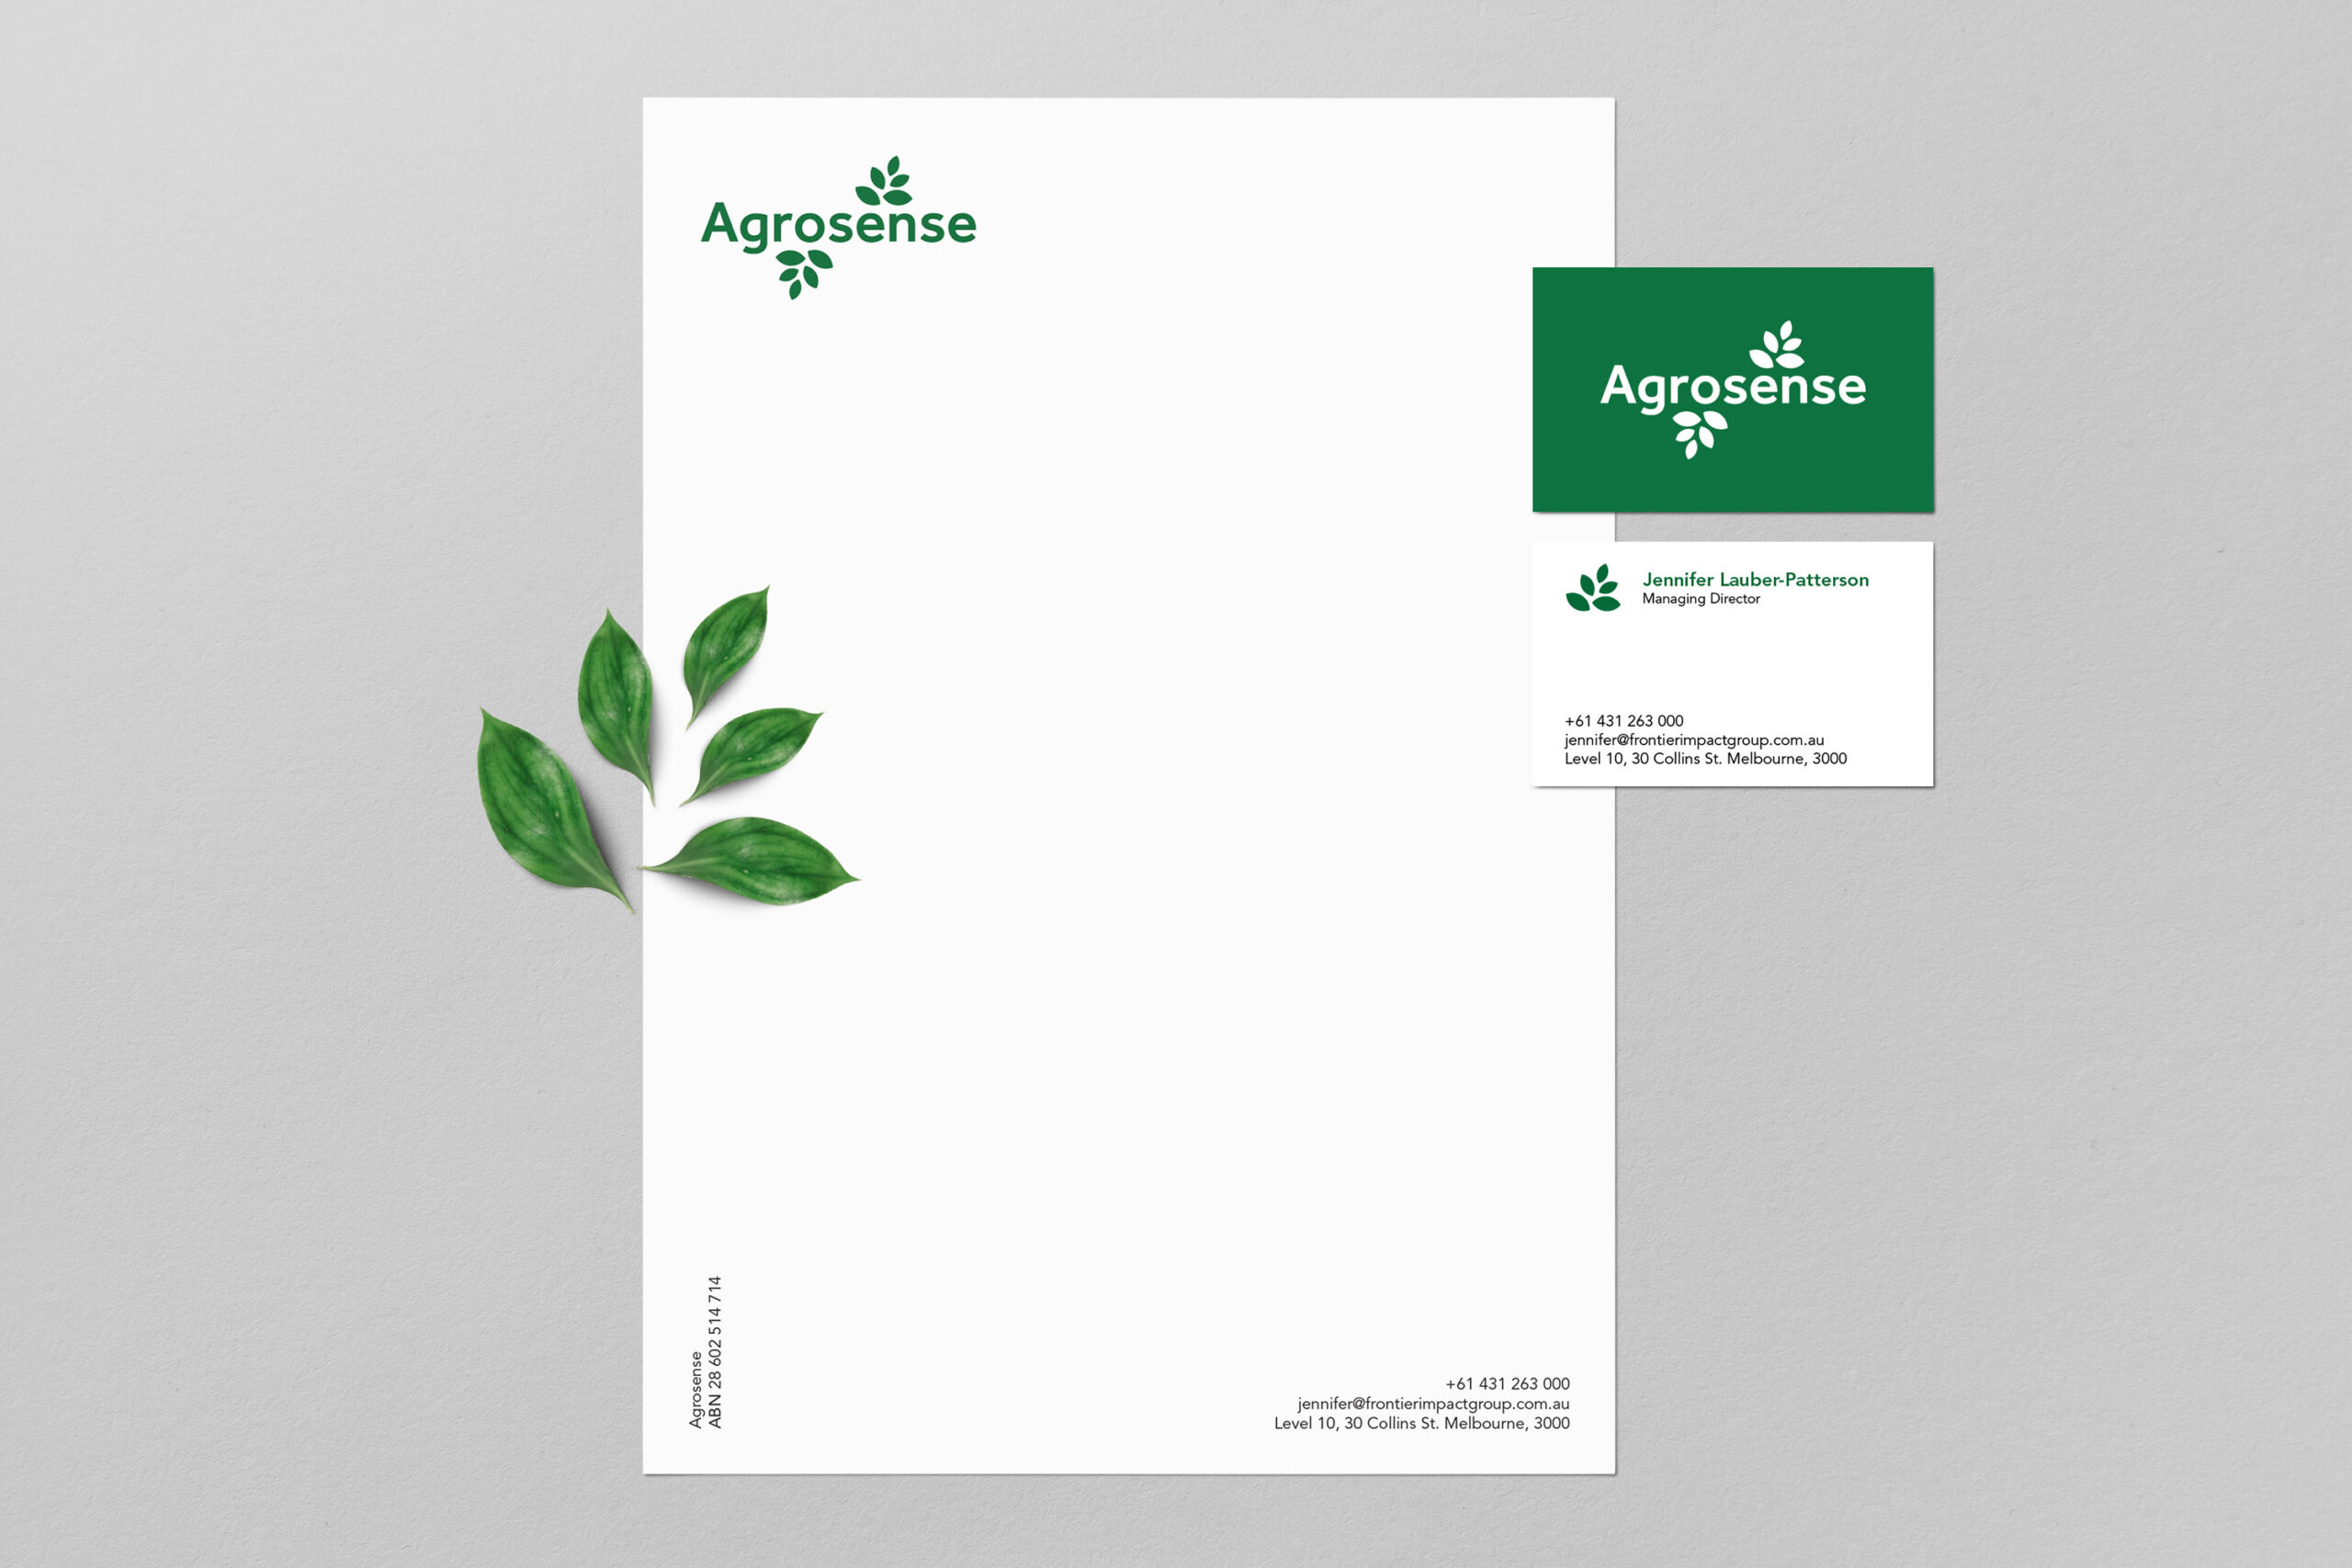 Agrosense_Stationery_compressed